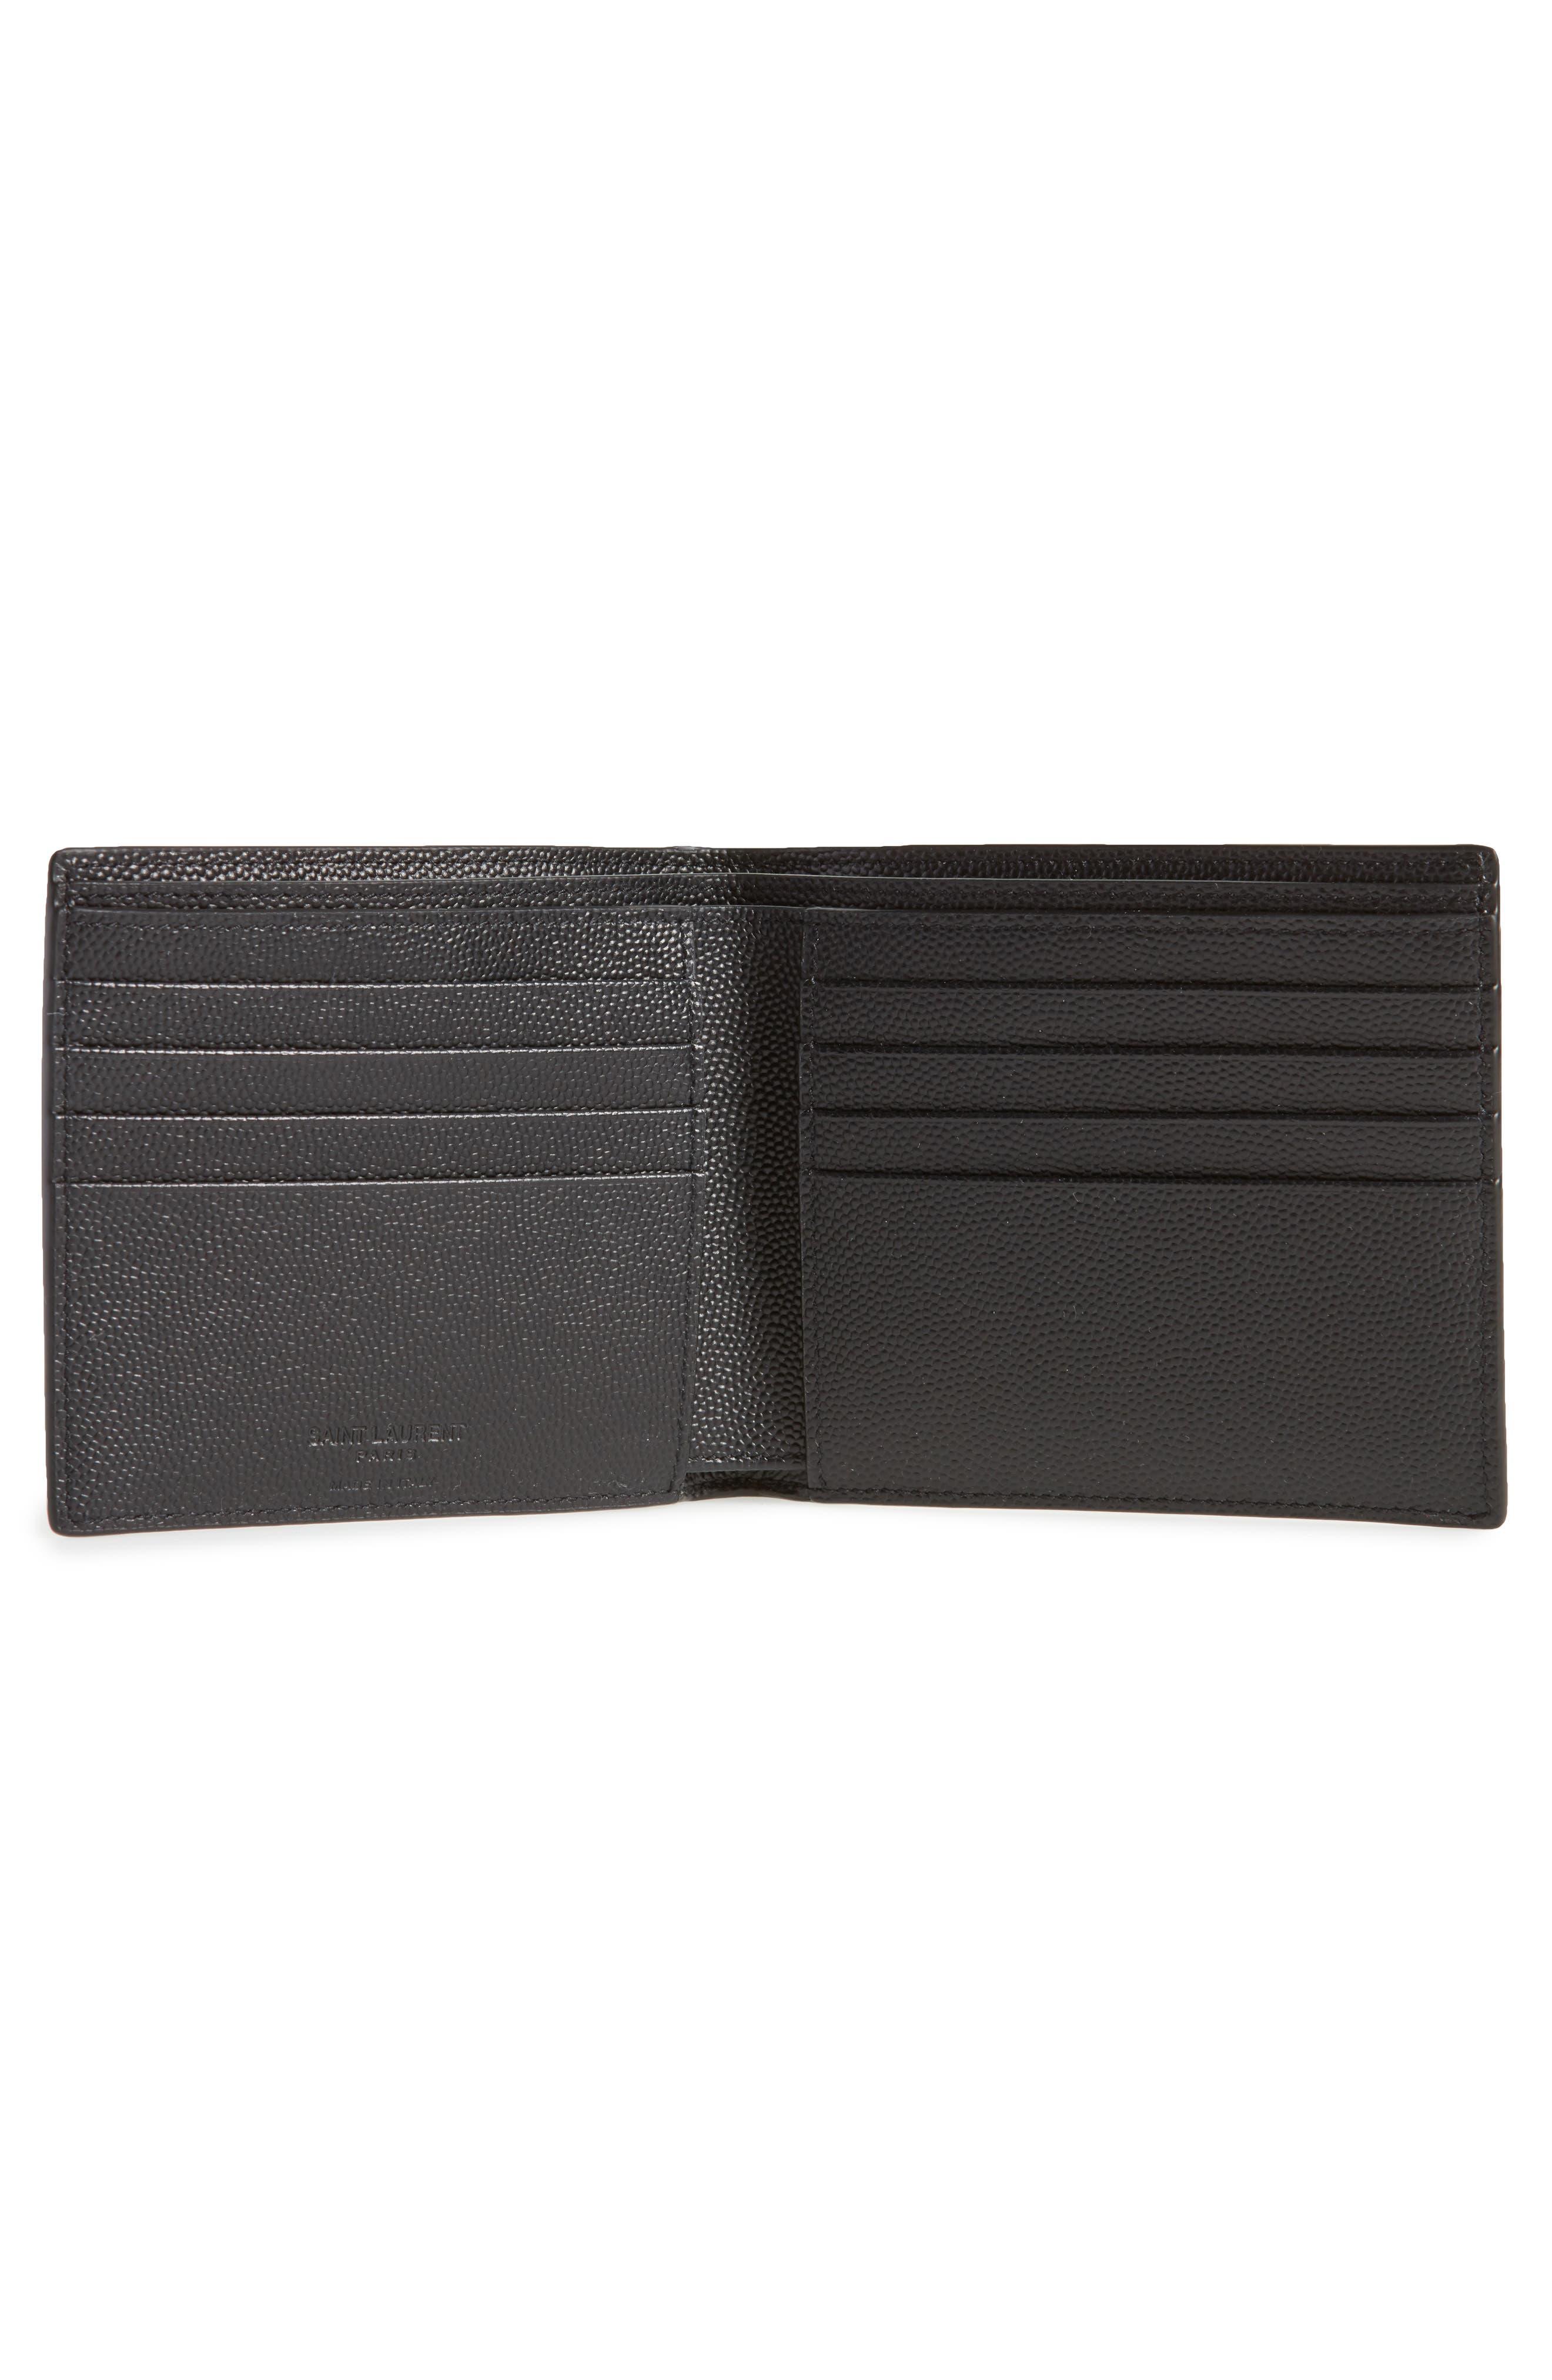 Pebble Grain Leather Wallet,                             Alternate thumbnail 2, color,                             Nero